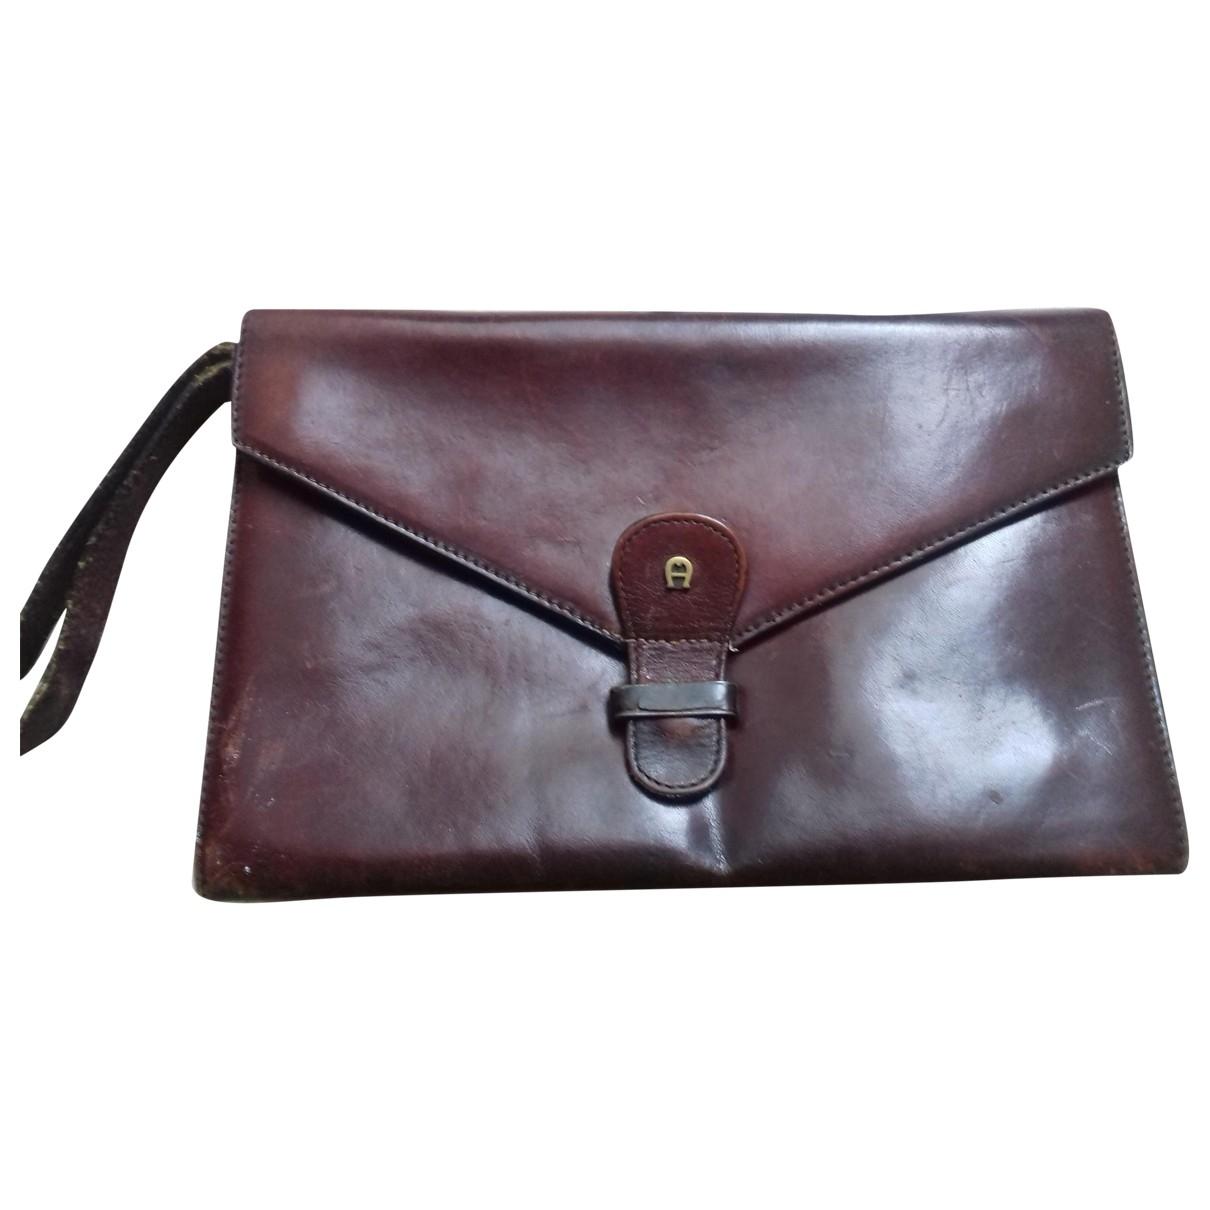 Etienne Aigner \N Burgundy Patent leather bag for Men \N